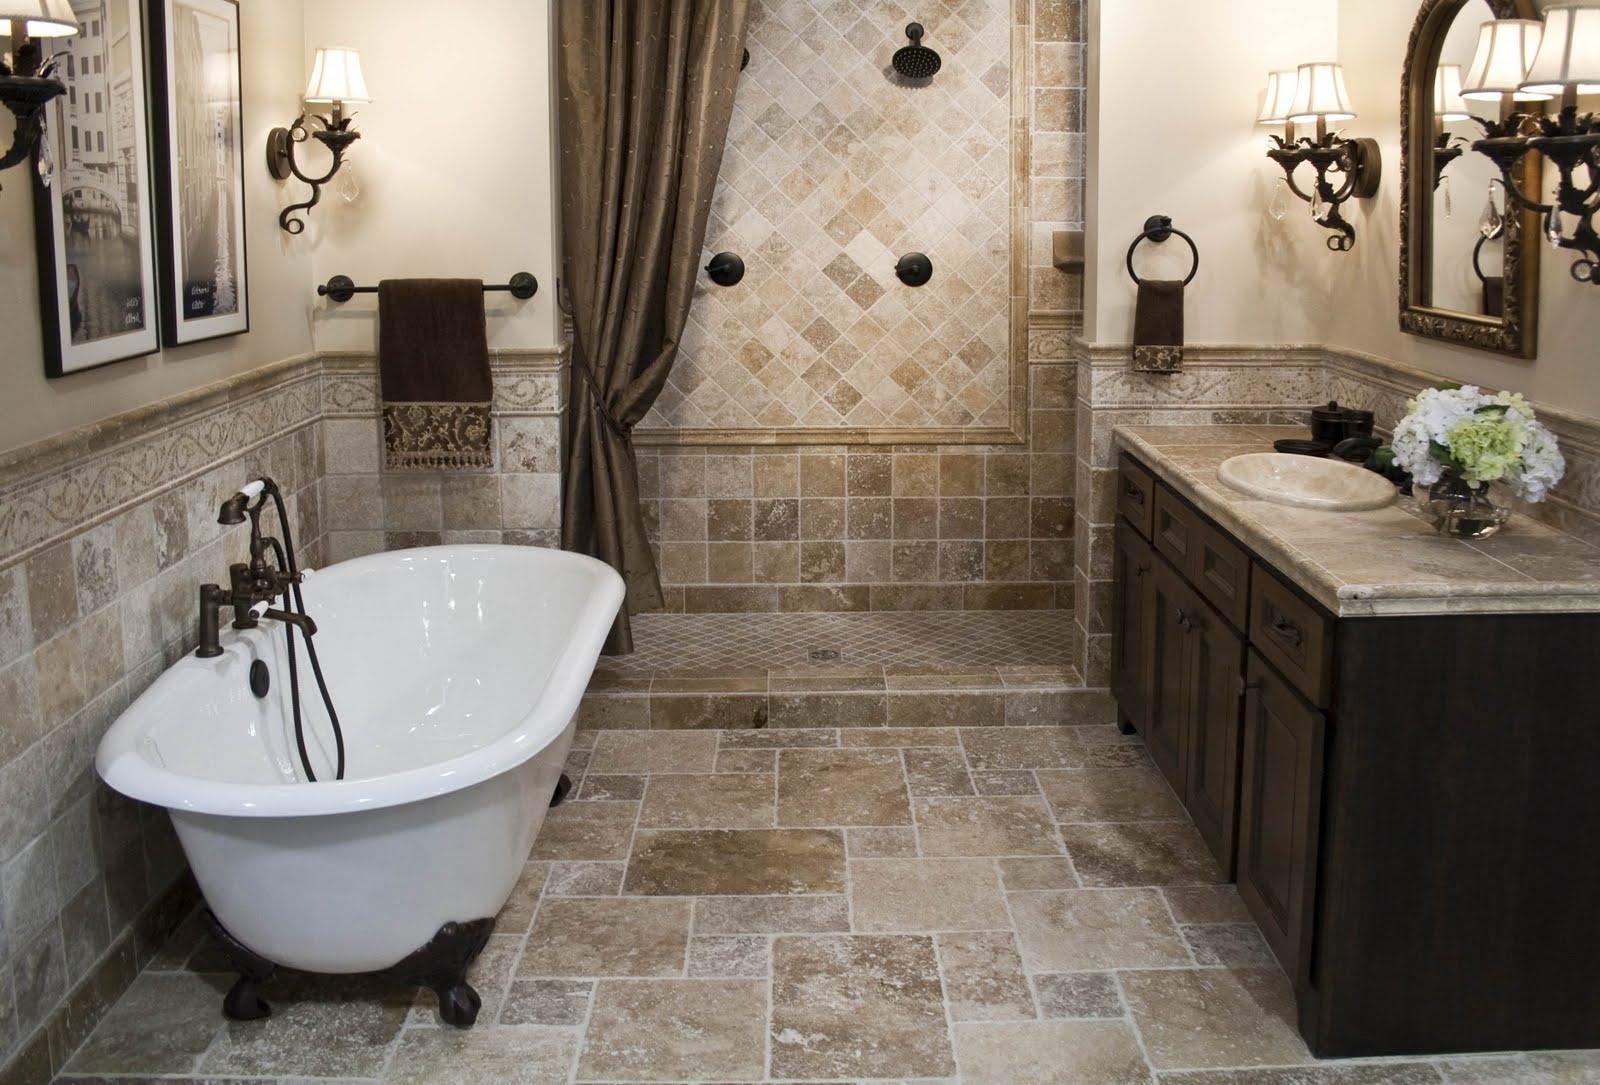 Bathroom Remodels | Katy Construction & Remodeling Regarding Bathroom Remodel (View 16 of 33)